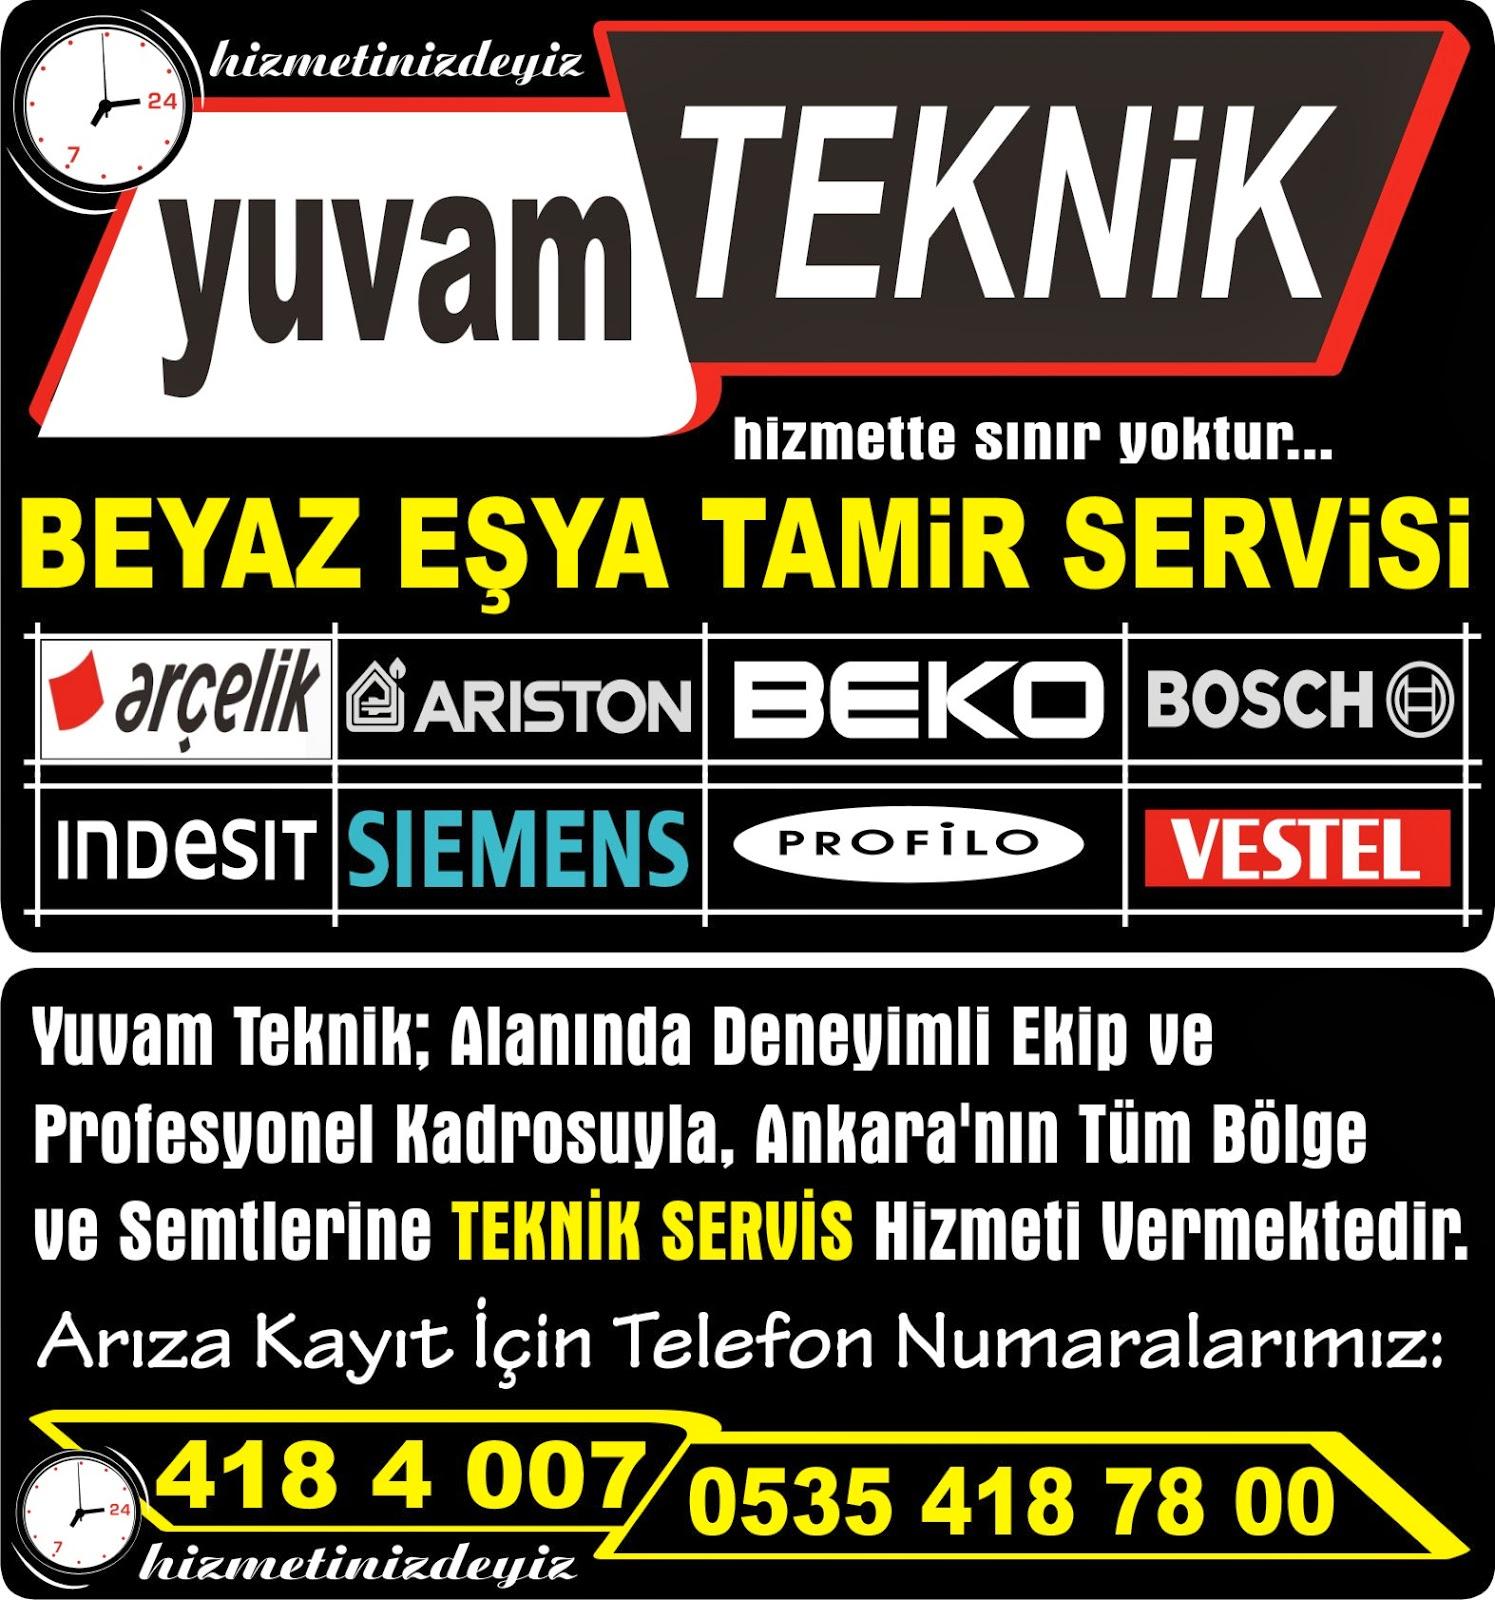 Bosch Yetkili Servis Bahçelievler Ankara